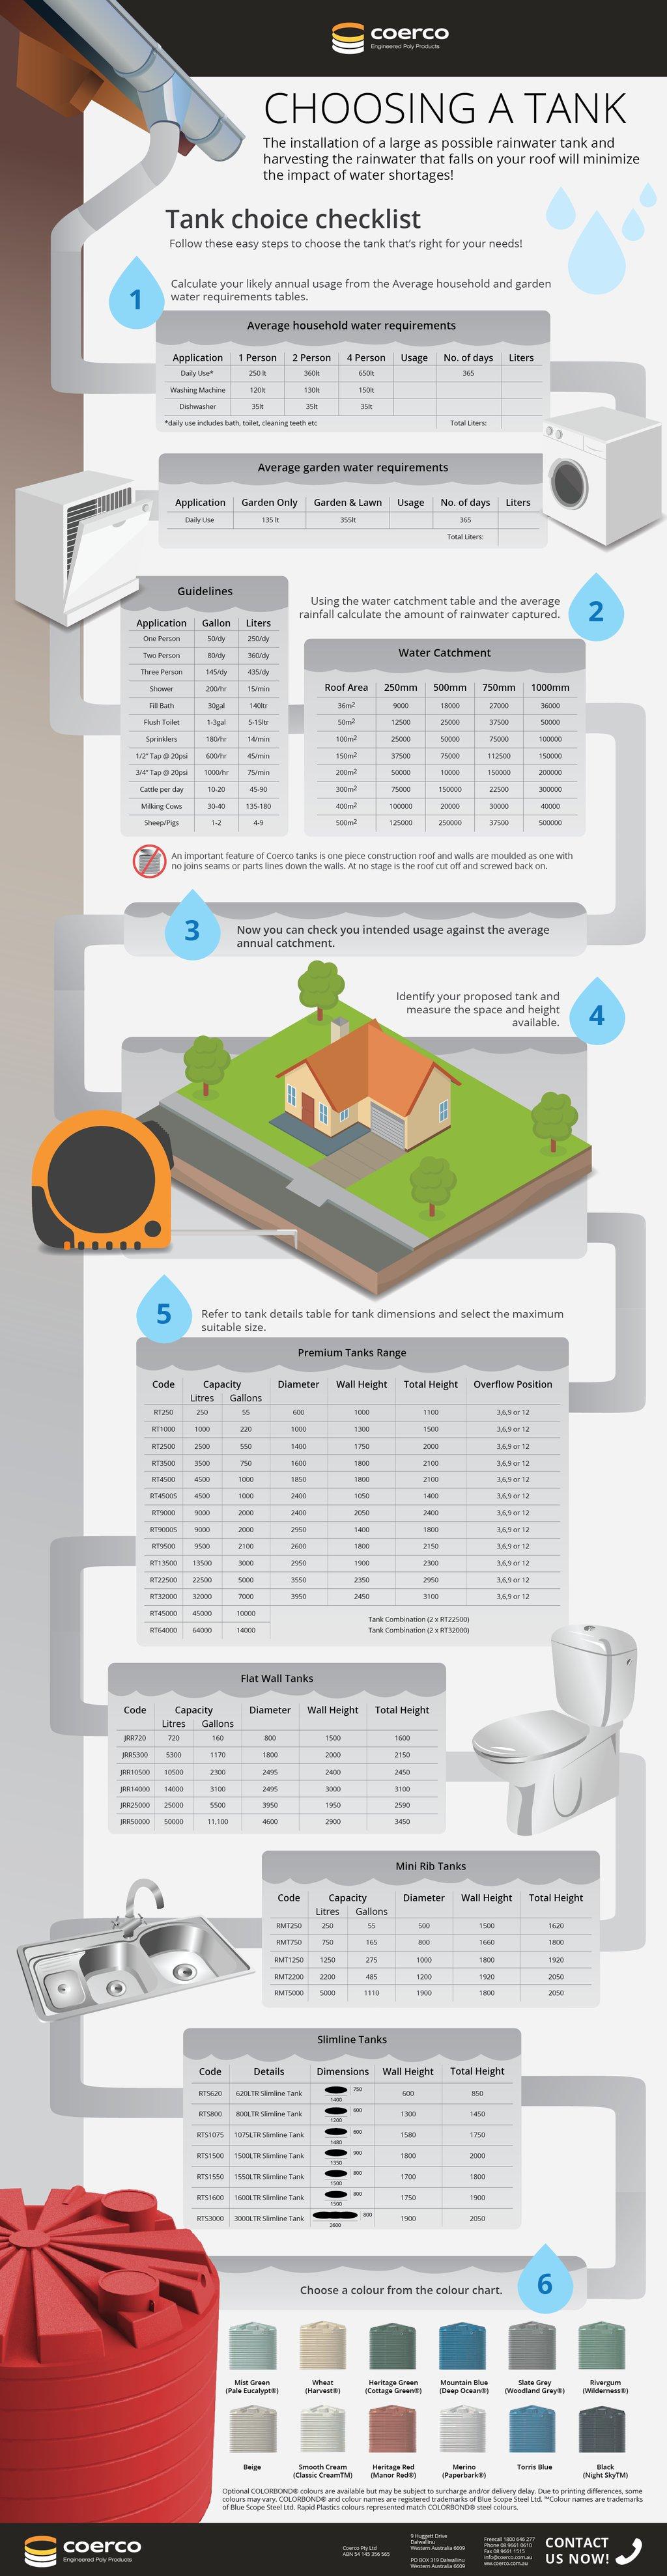 coerco-choosing-a-tank-infographics.png